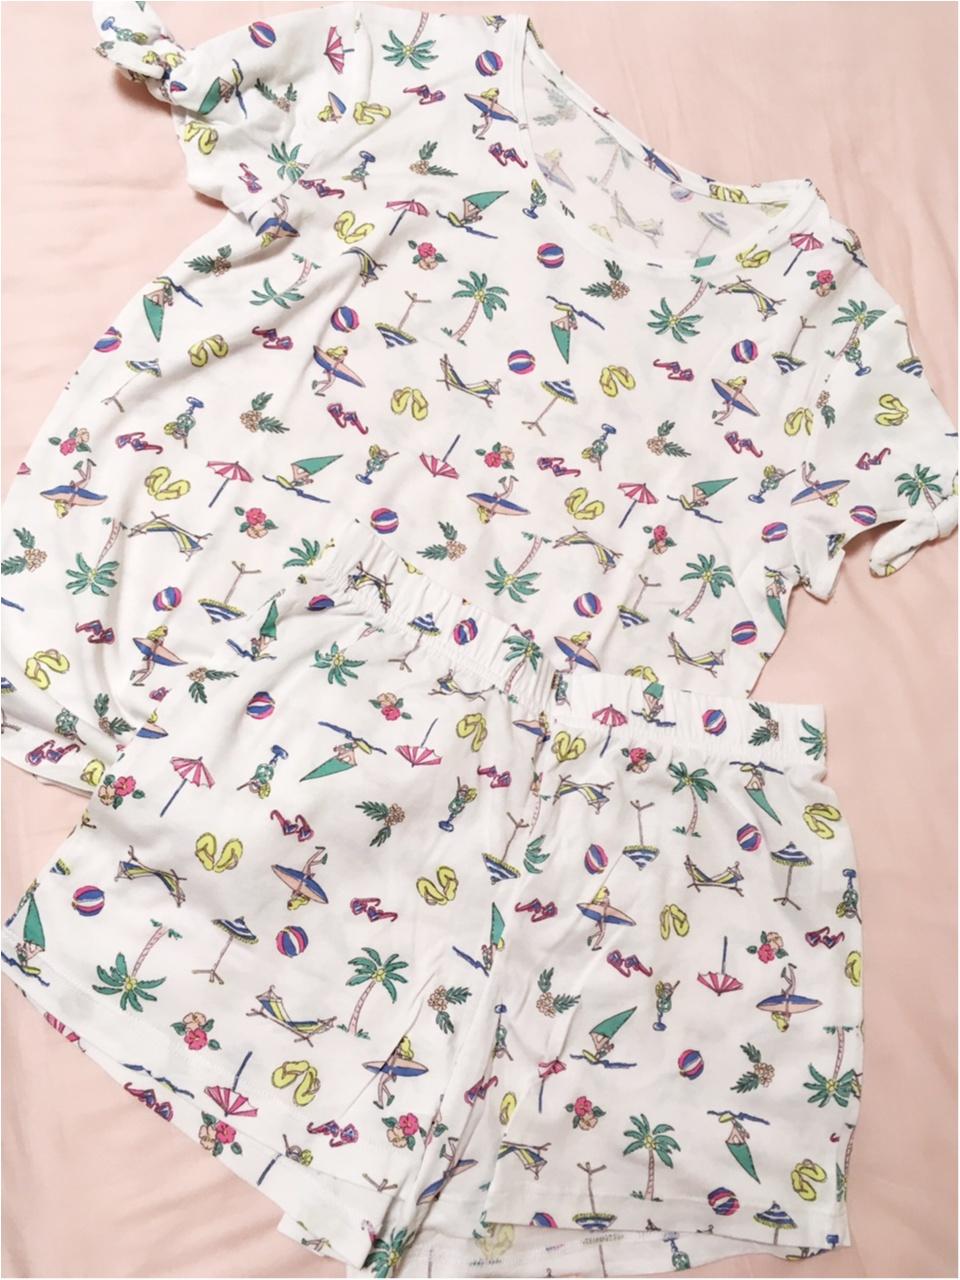 【GU】パジャマだけじゃない!楽〜にのんびりくつろげる♡【ラウンジウェア】にも大注目!!!_3